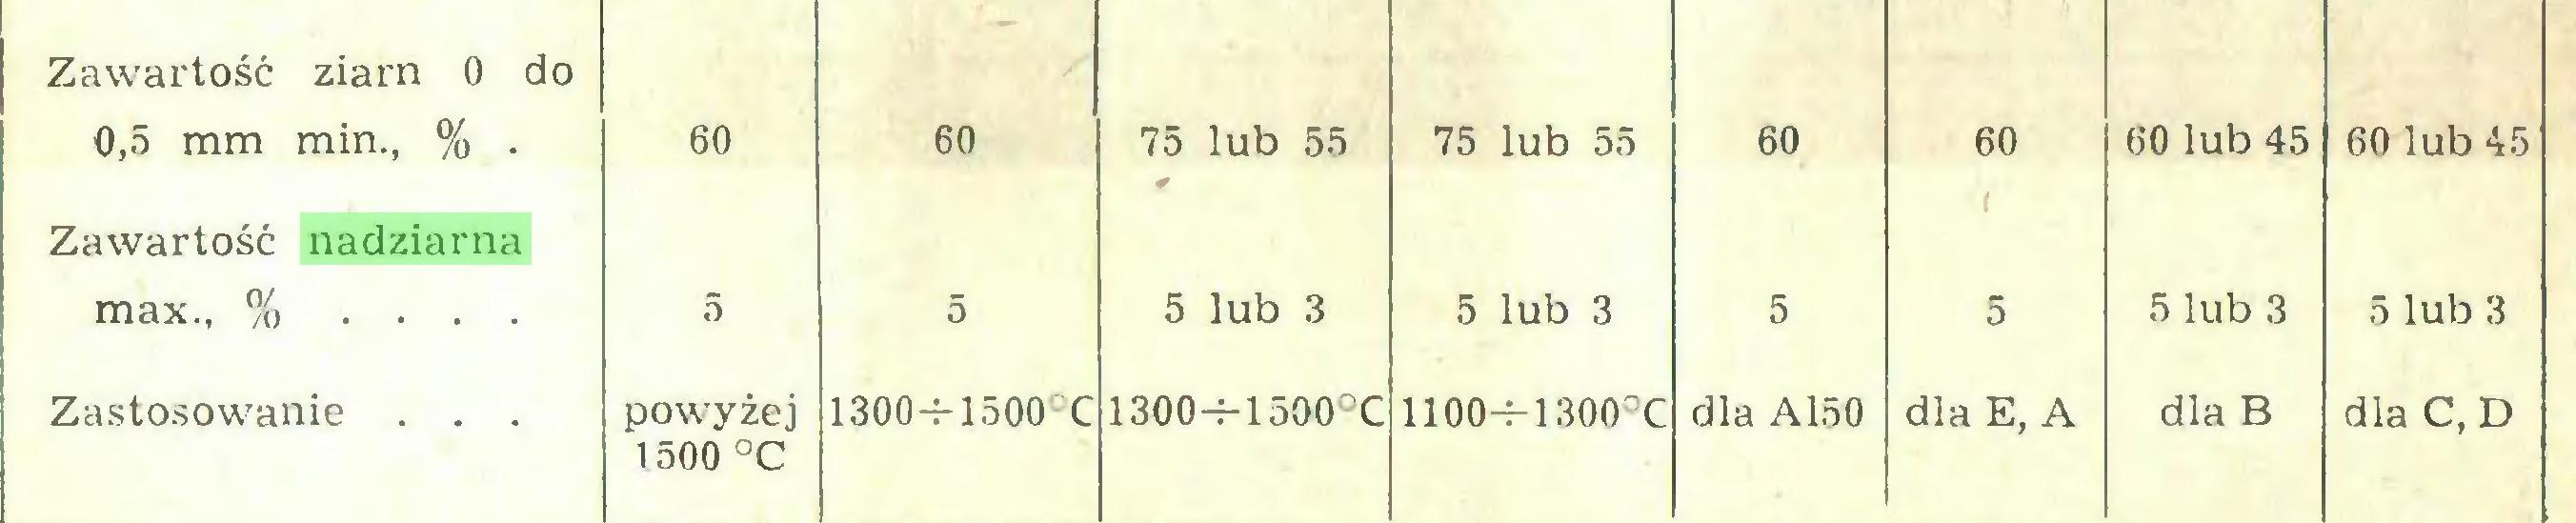 (...) Zawartość ziarn 0 do 0,5 mm min., % . 60 60 75 lub 55 75 lub 55 60 60 60 lub 45 60 lub 45 Zawartość nadziarna ( max., % ... 5 5 5 lub 3 5 lub 3 5 5 5 lub 3 5 lub 3 Zastosowanie . . . powyżej 1500 °C 1300-t-1500°C 1300-r-1500°C 1100-M300°C dla A150 dla E, A dla B dla C, D...